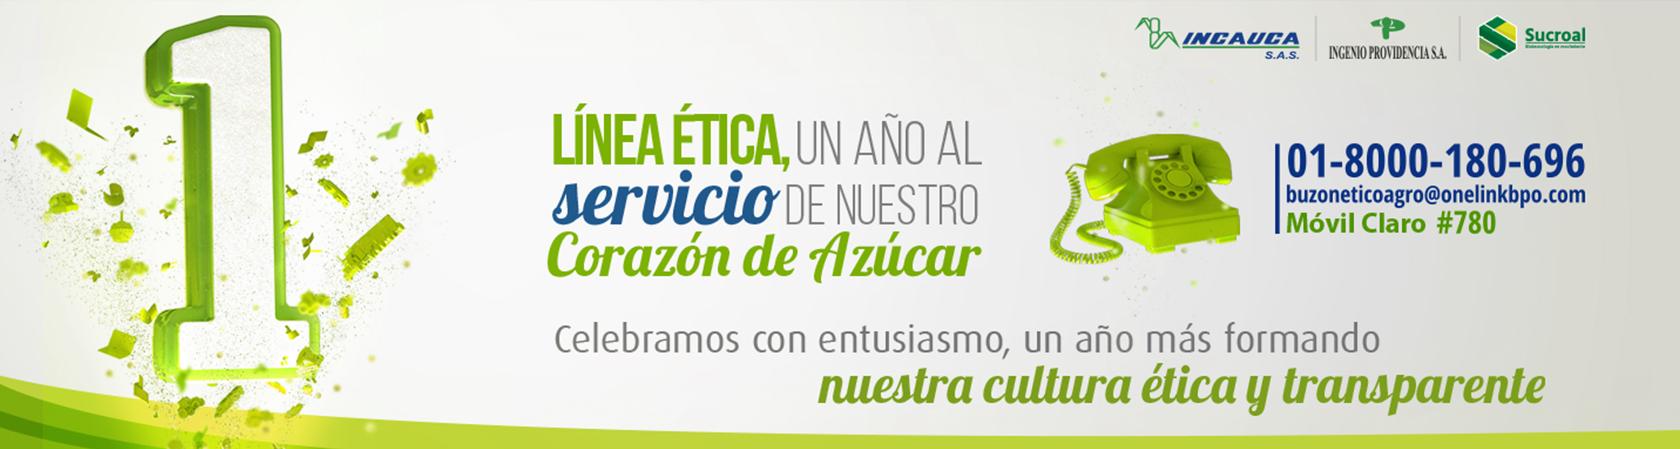 linea-etica_ing-providencia_en